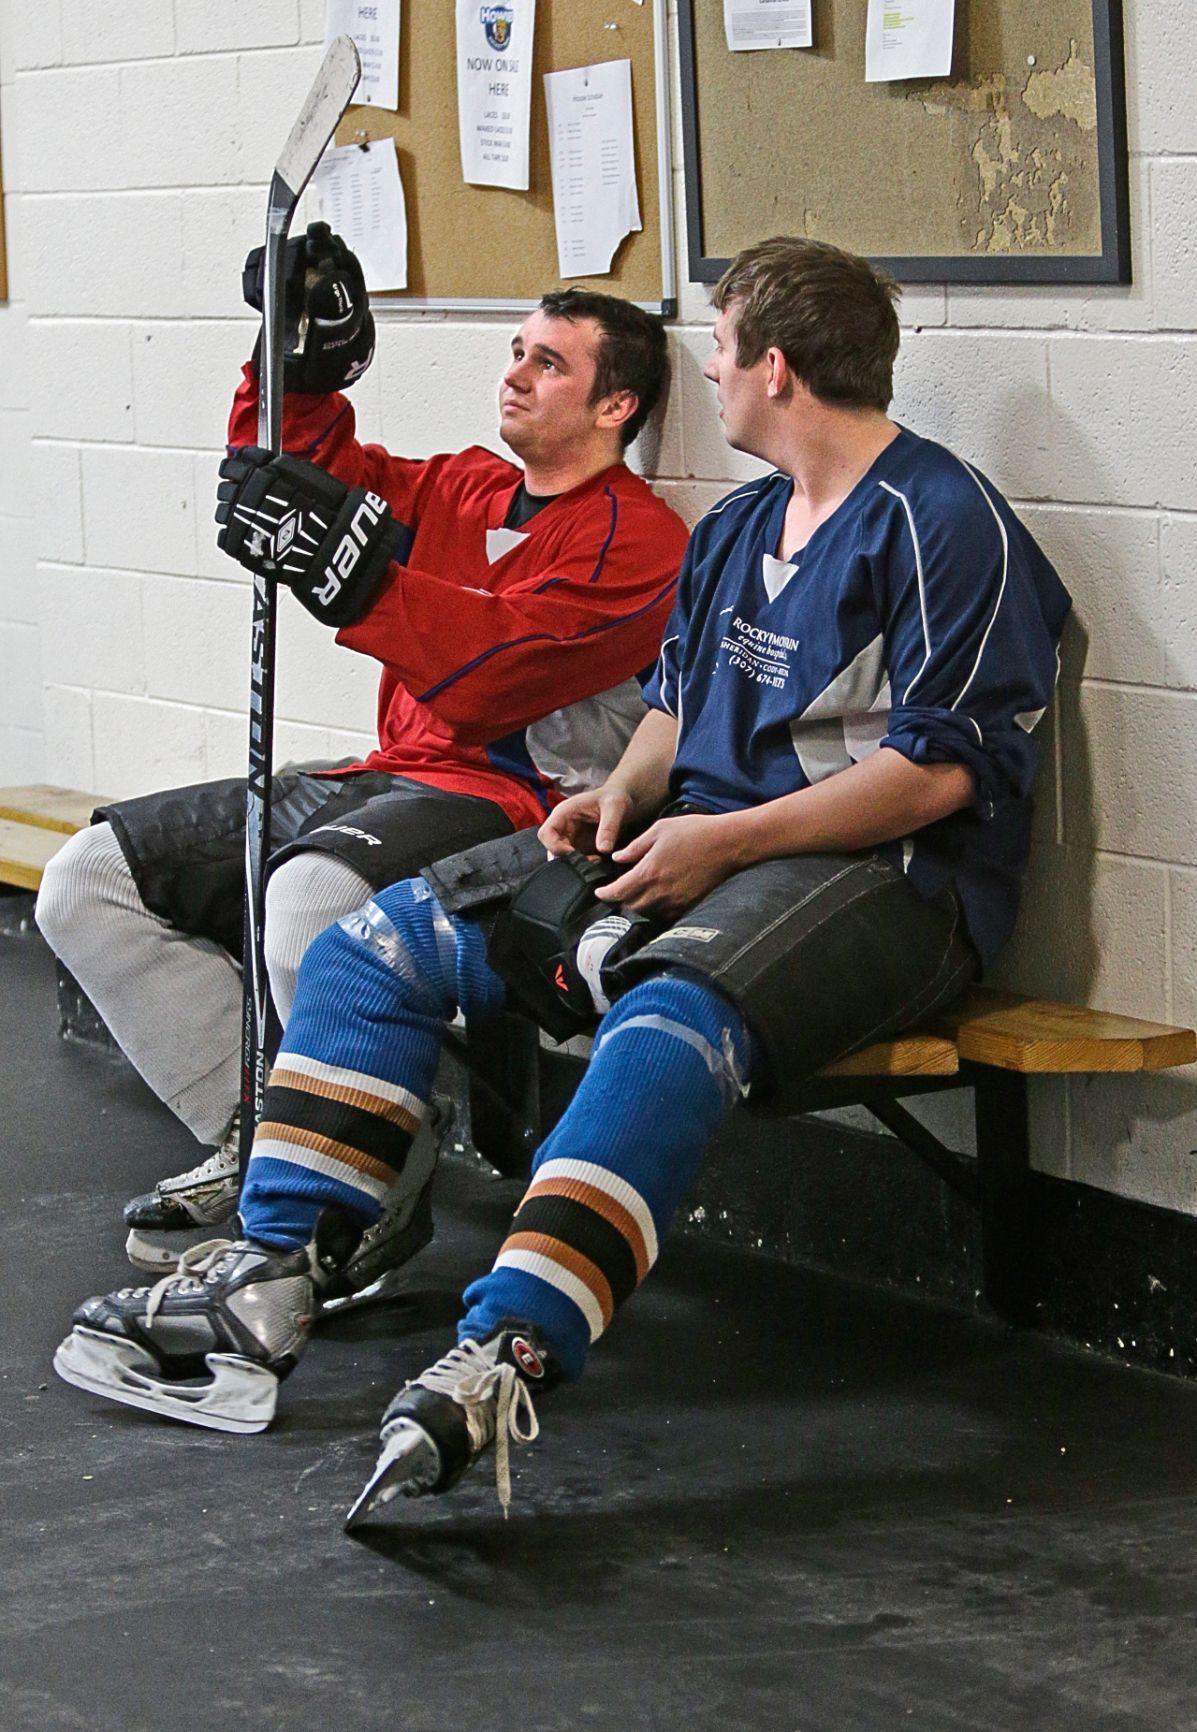 Adult hockey skill level